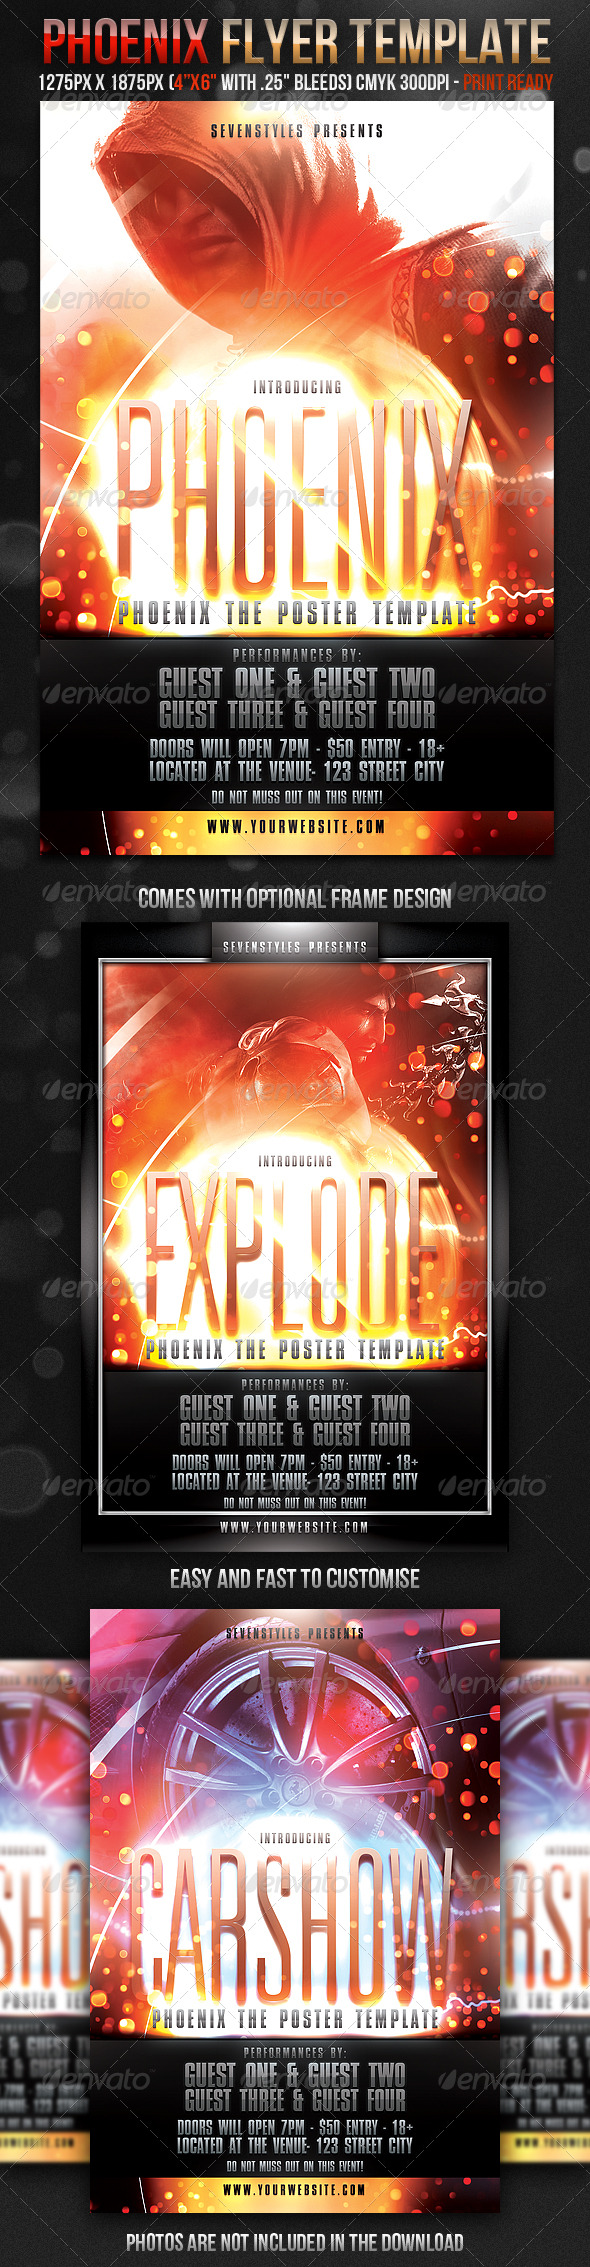 Phoenix Flyer Template - GraphicRiver Item for Sale